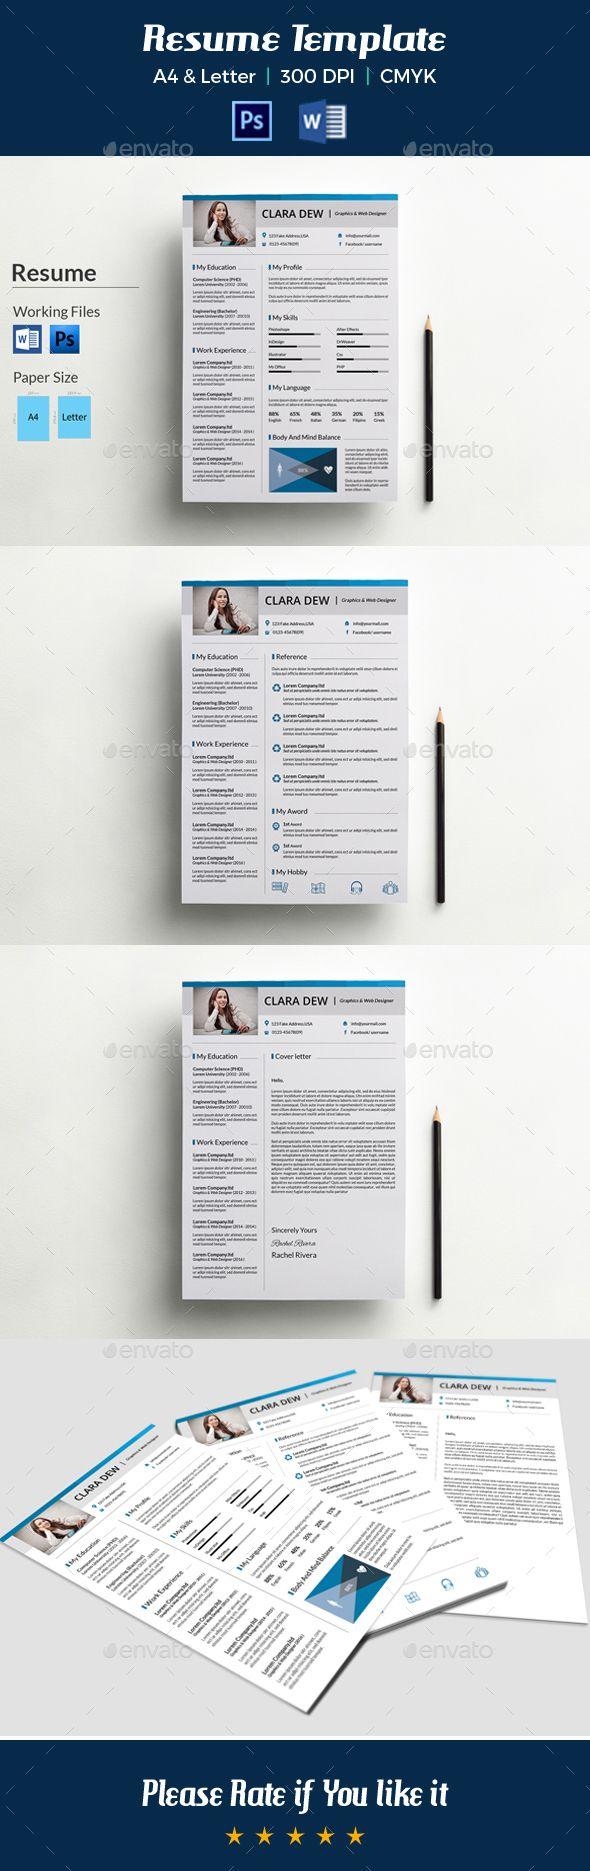 Image result for bayo data image | Grammar | Pinterest